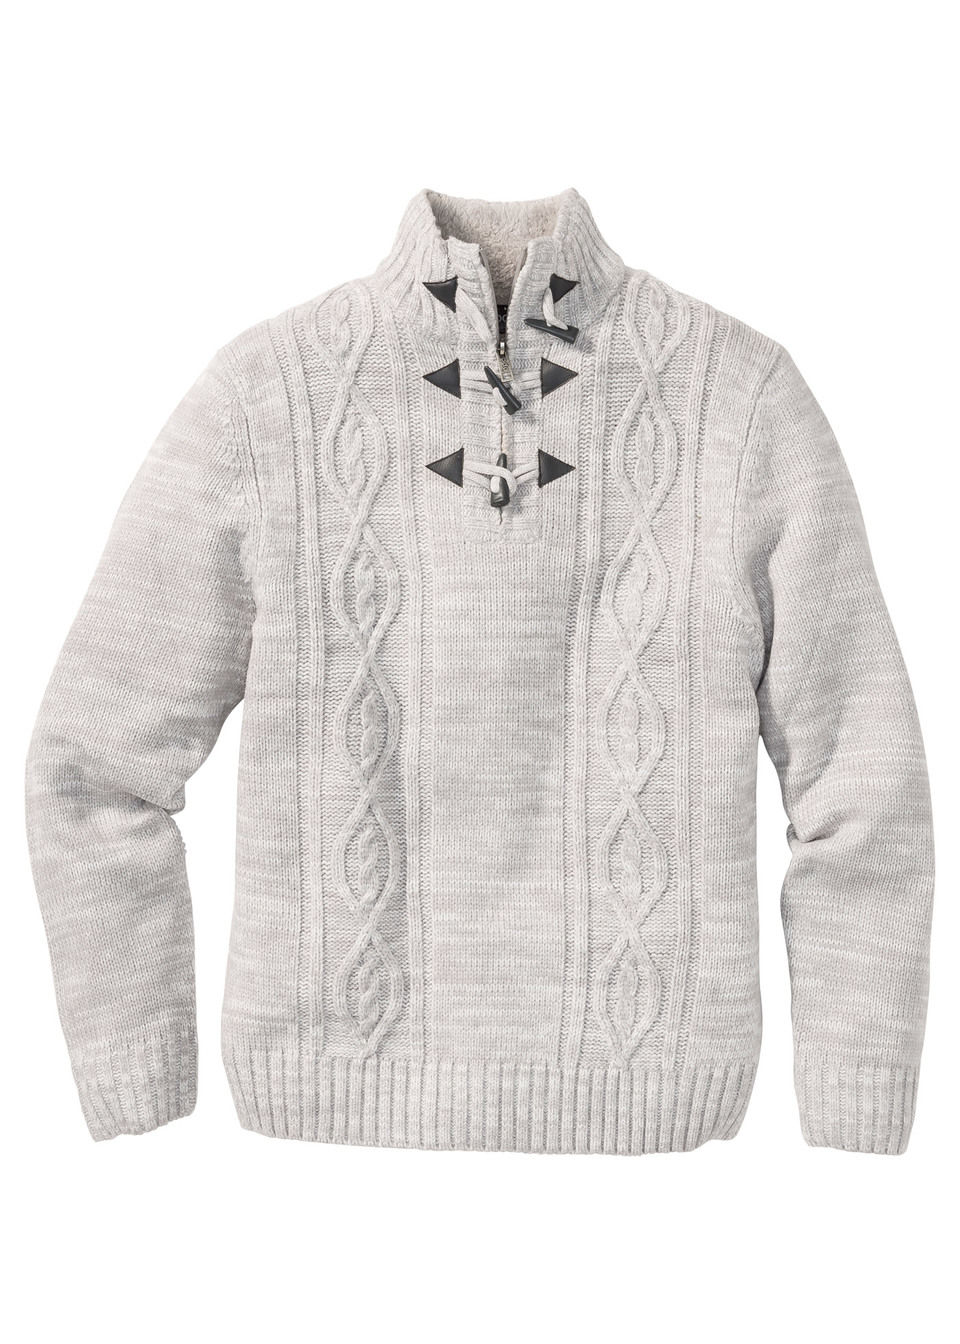 Пуловер Regular Fit c узором «косичка»